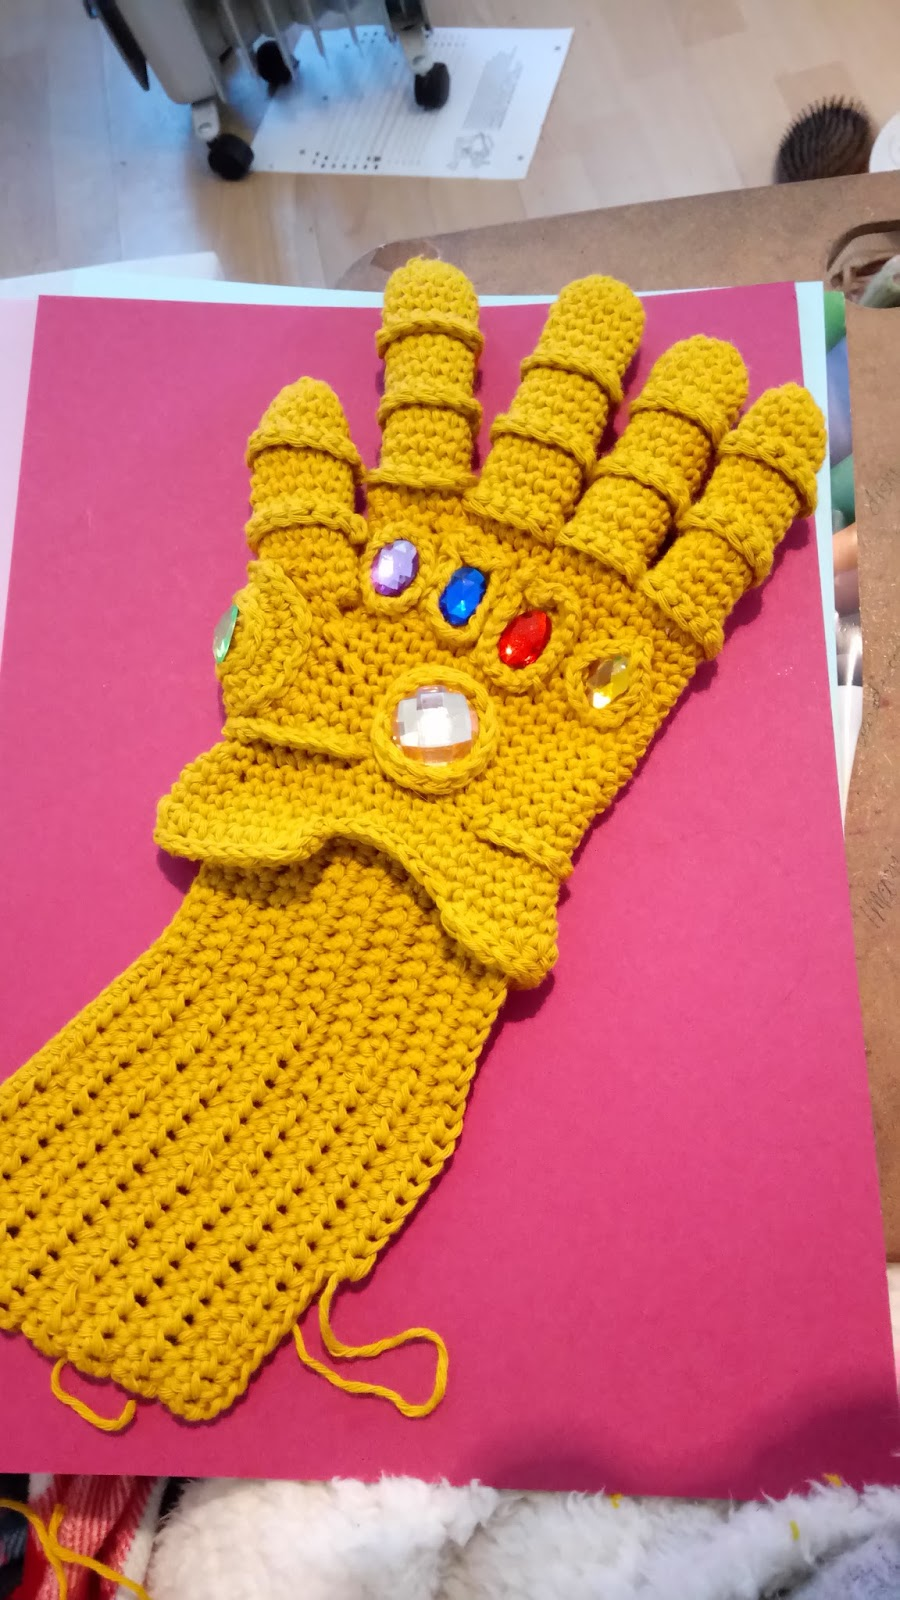 Thanos Crochet Pattern, Thanos Amigurumi Crochet Doll Pattern ... | 1600x900